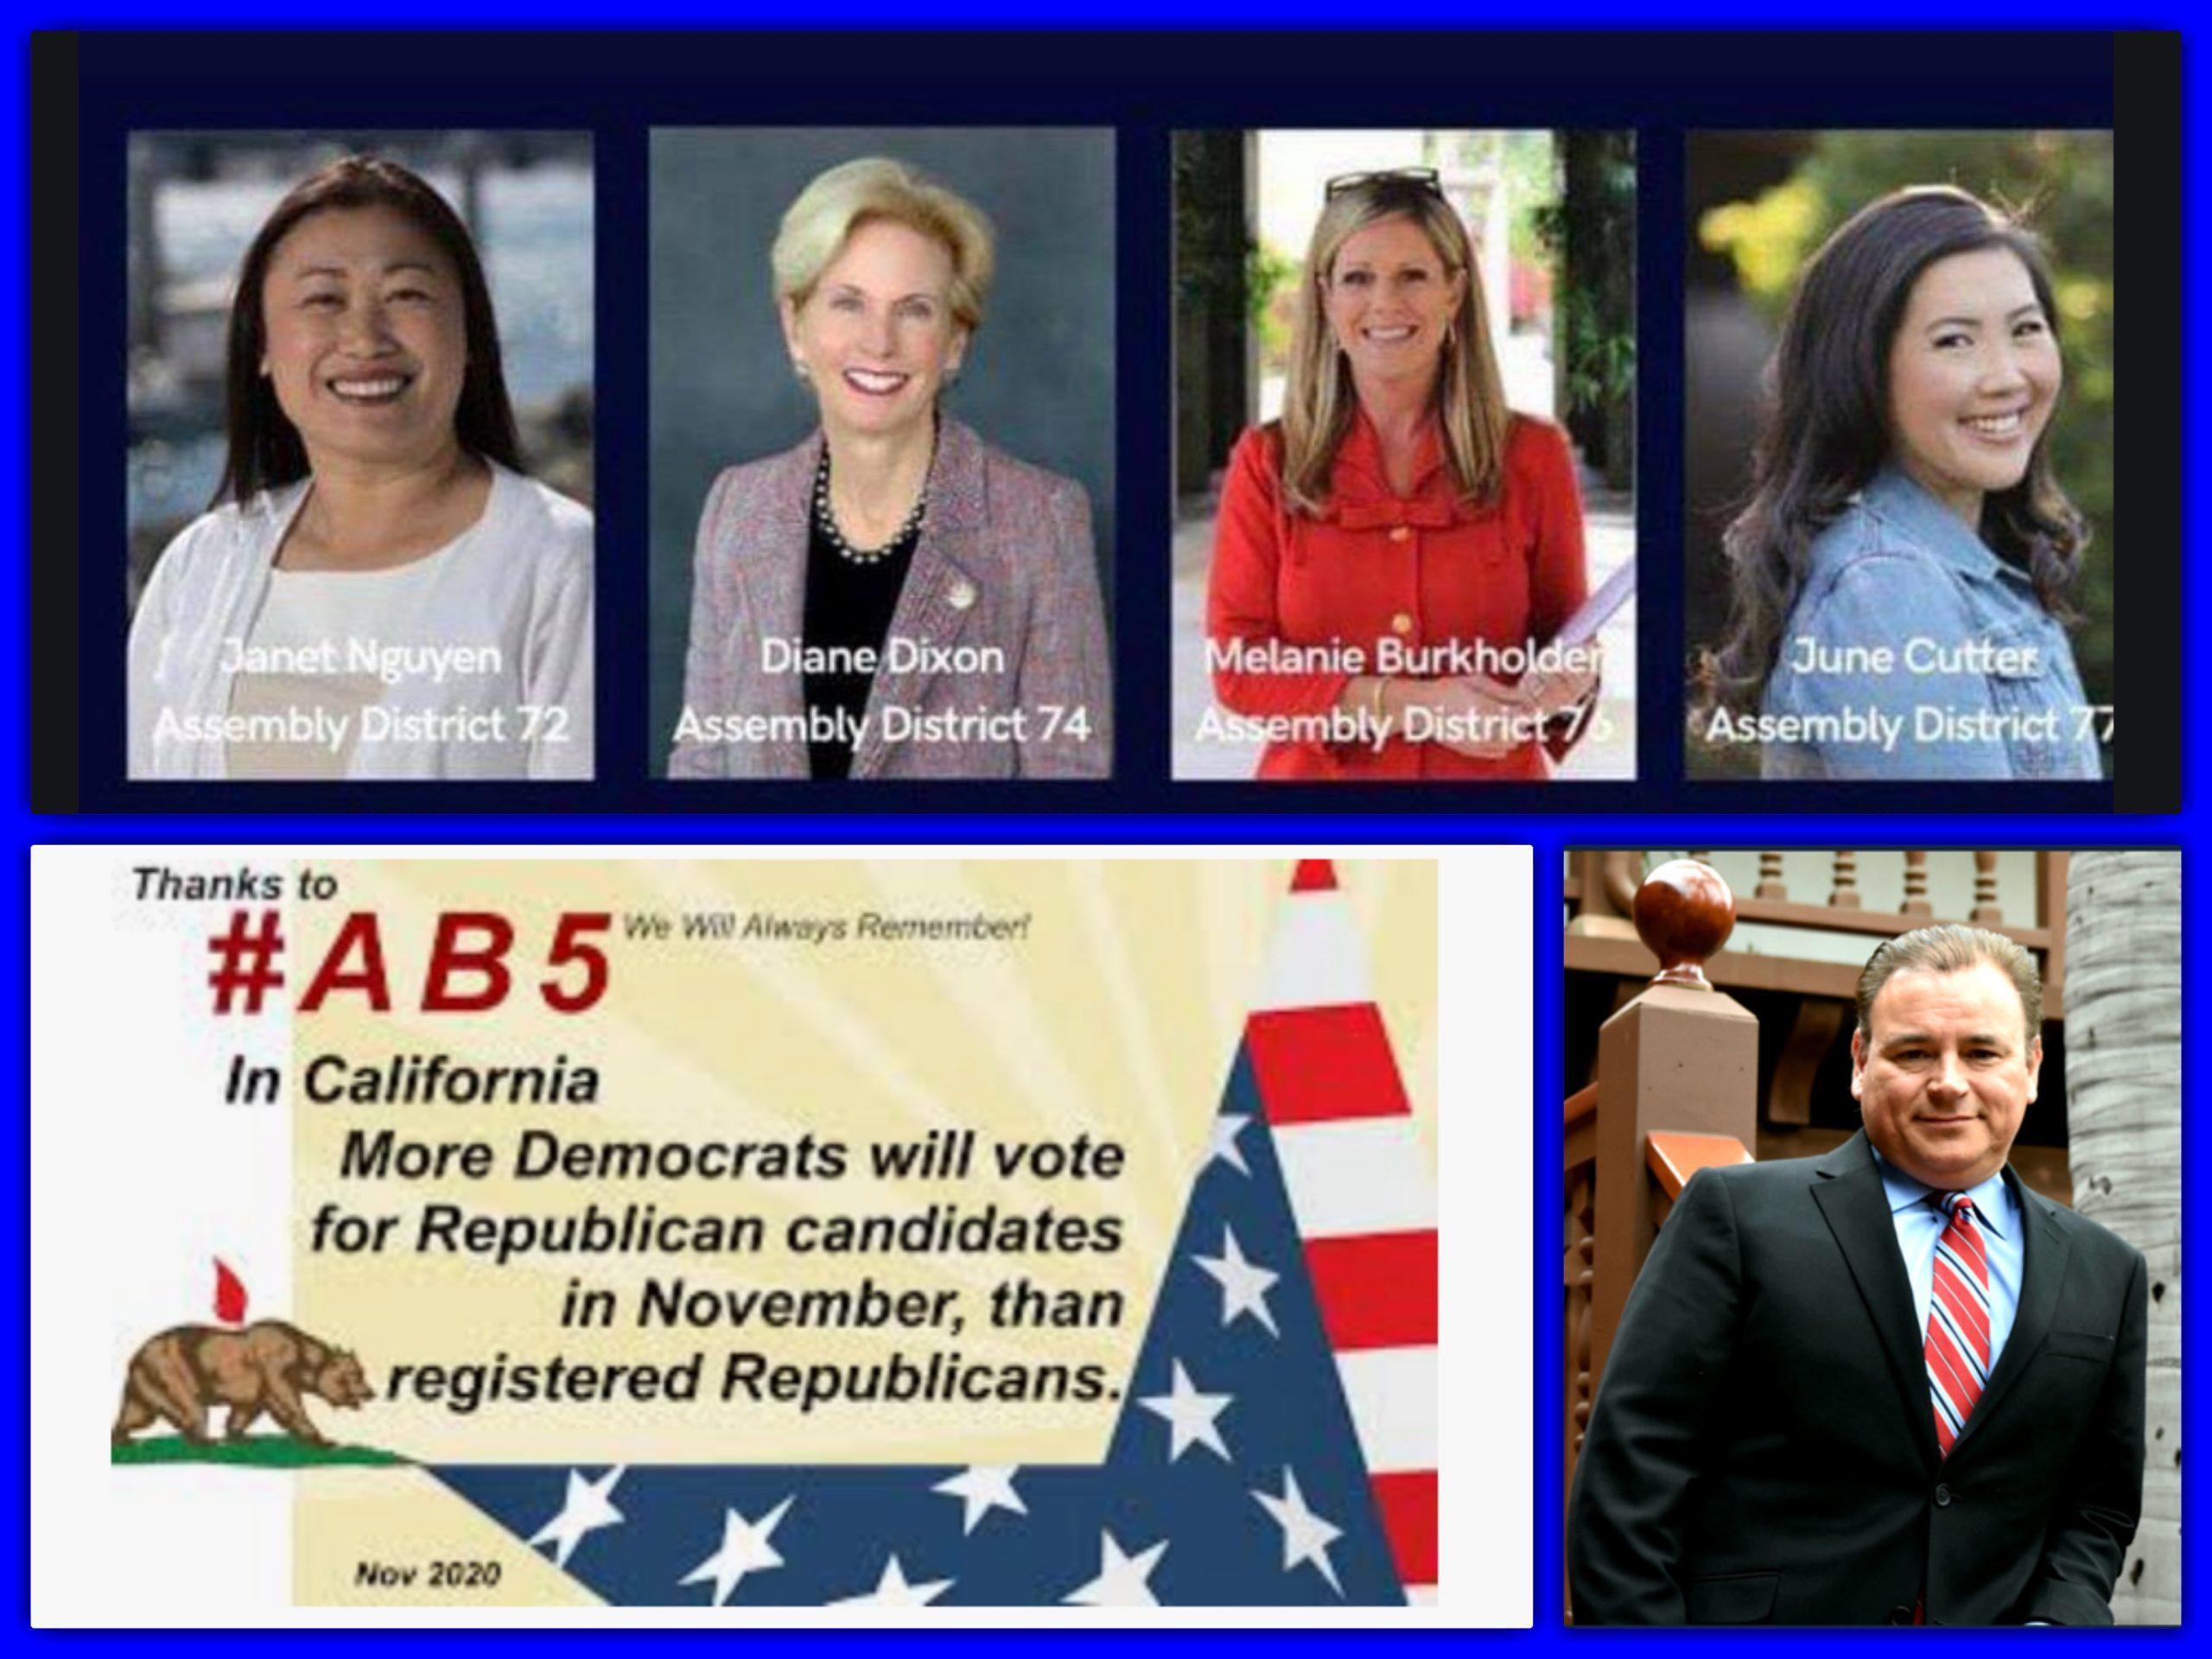 AB 5, Lorena Gonzalez, Democrats, Joe Biden, Kamala Harris, Stop AB 5, Repeal AB 5, Defeat Lorena Gonzalez, Yes on Prop 22, Yes 22, UBER, LYFT